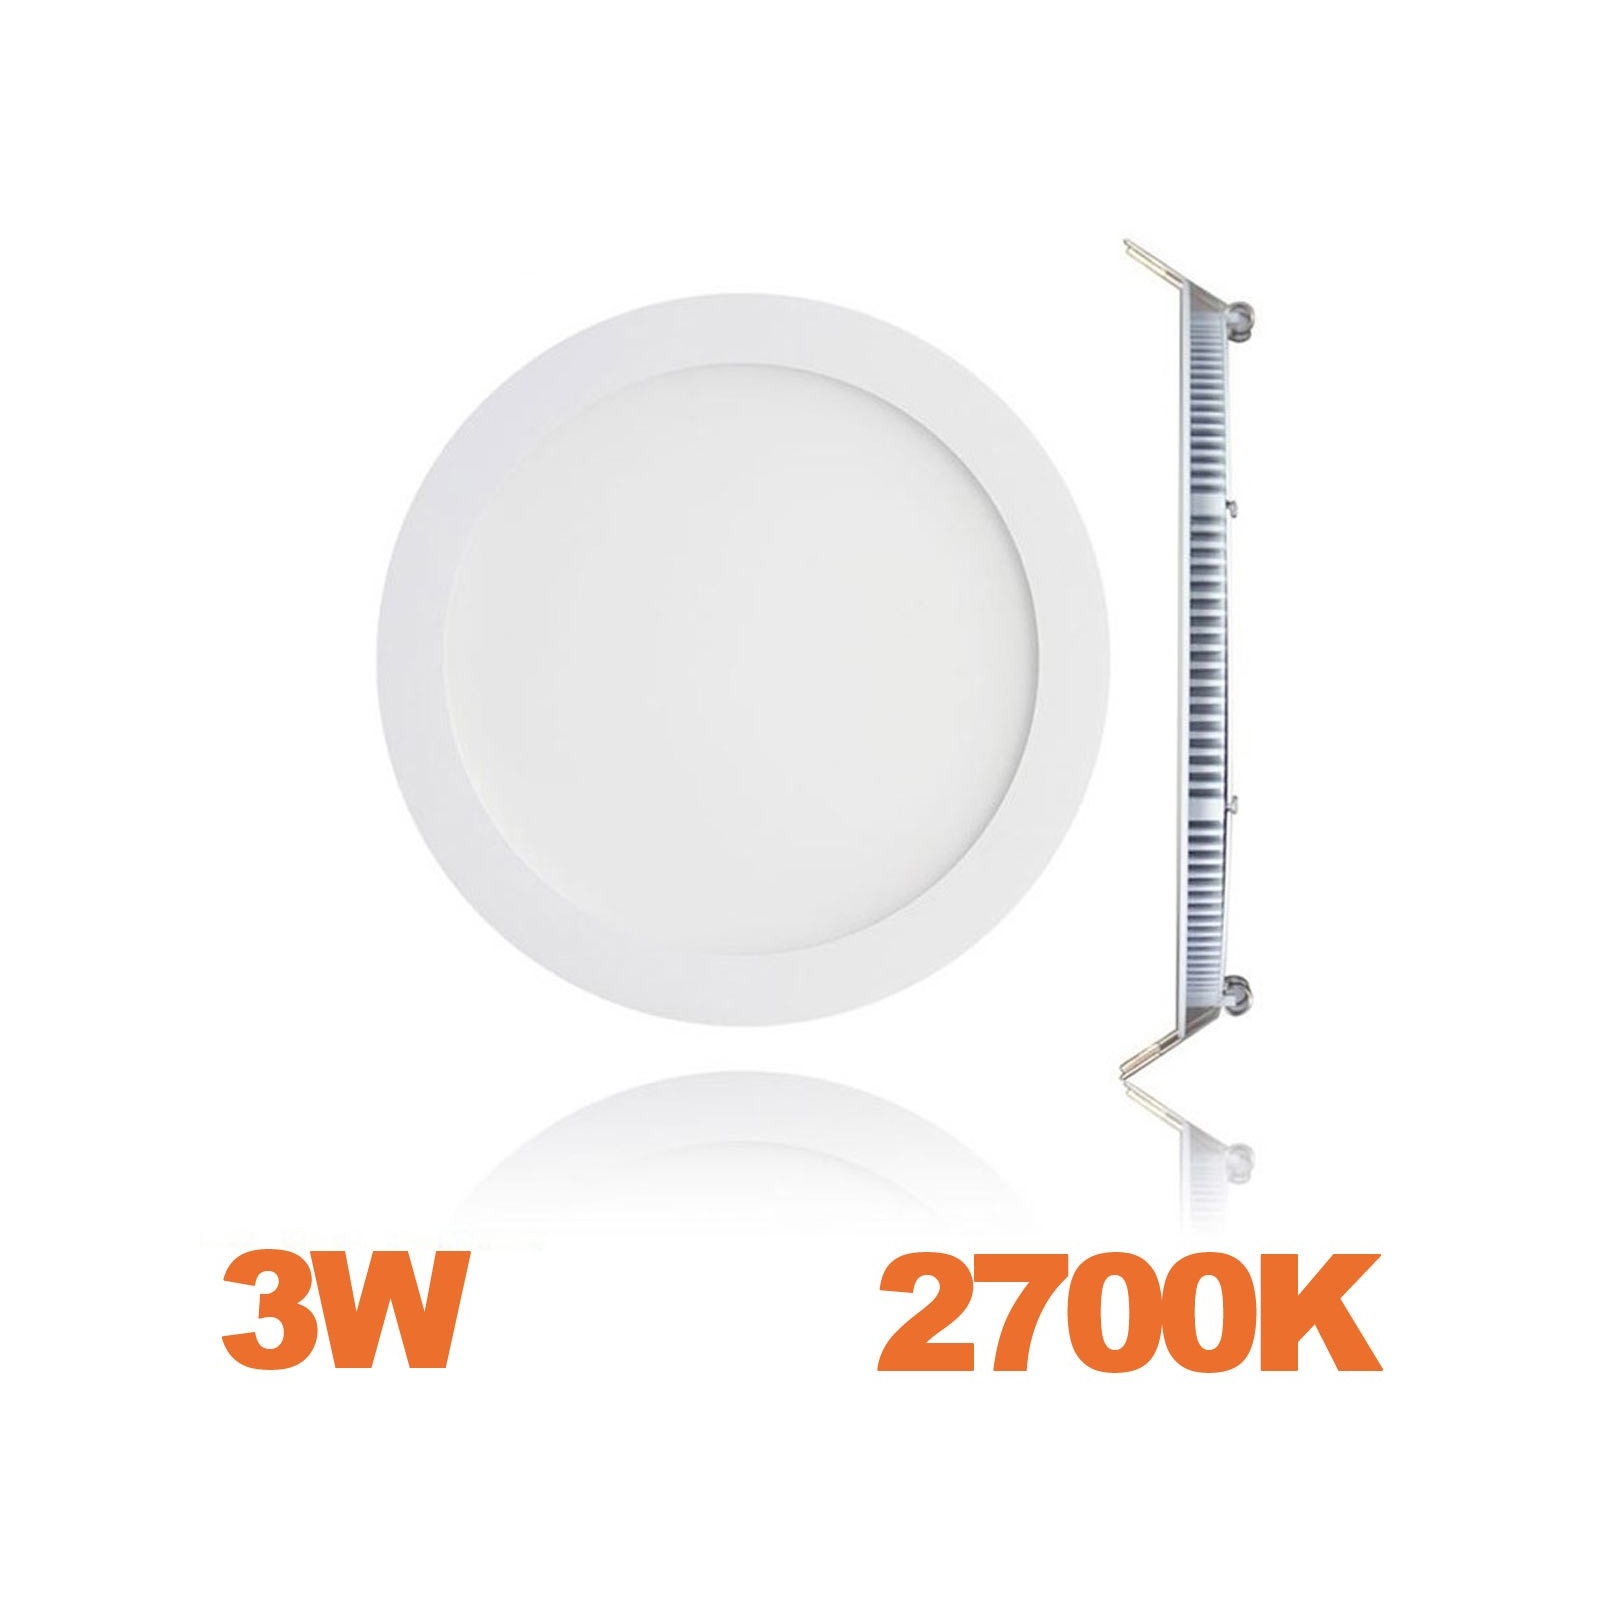 Spot Encastrable LED Downlight Panel Extra-Plat 3W Blanc Chaud 2700K